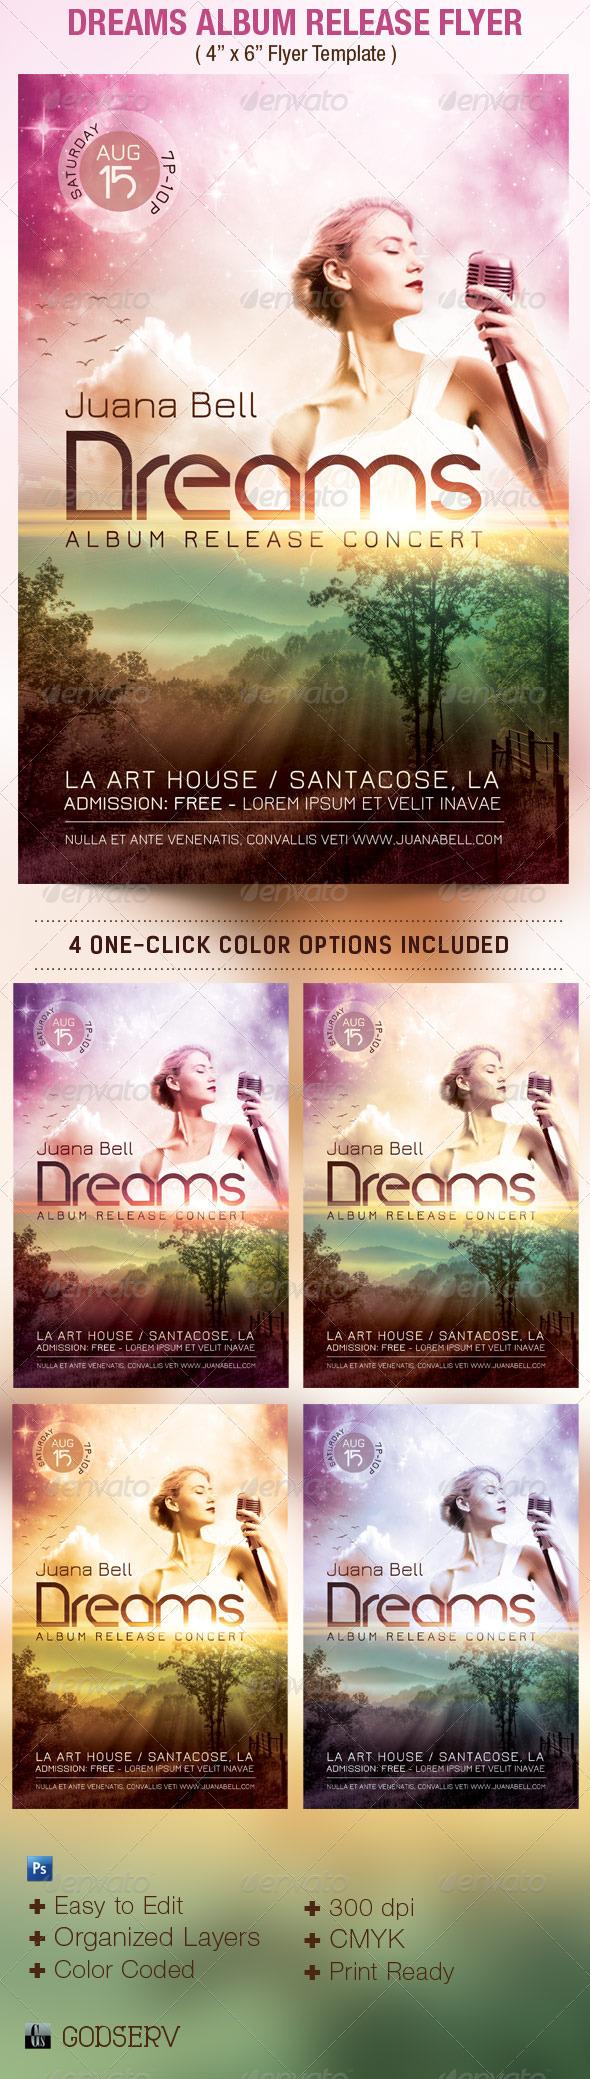 Dreams Album Release Flyer Template - Concerts Events